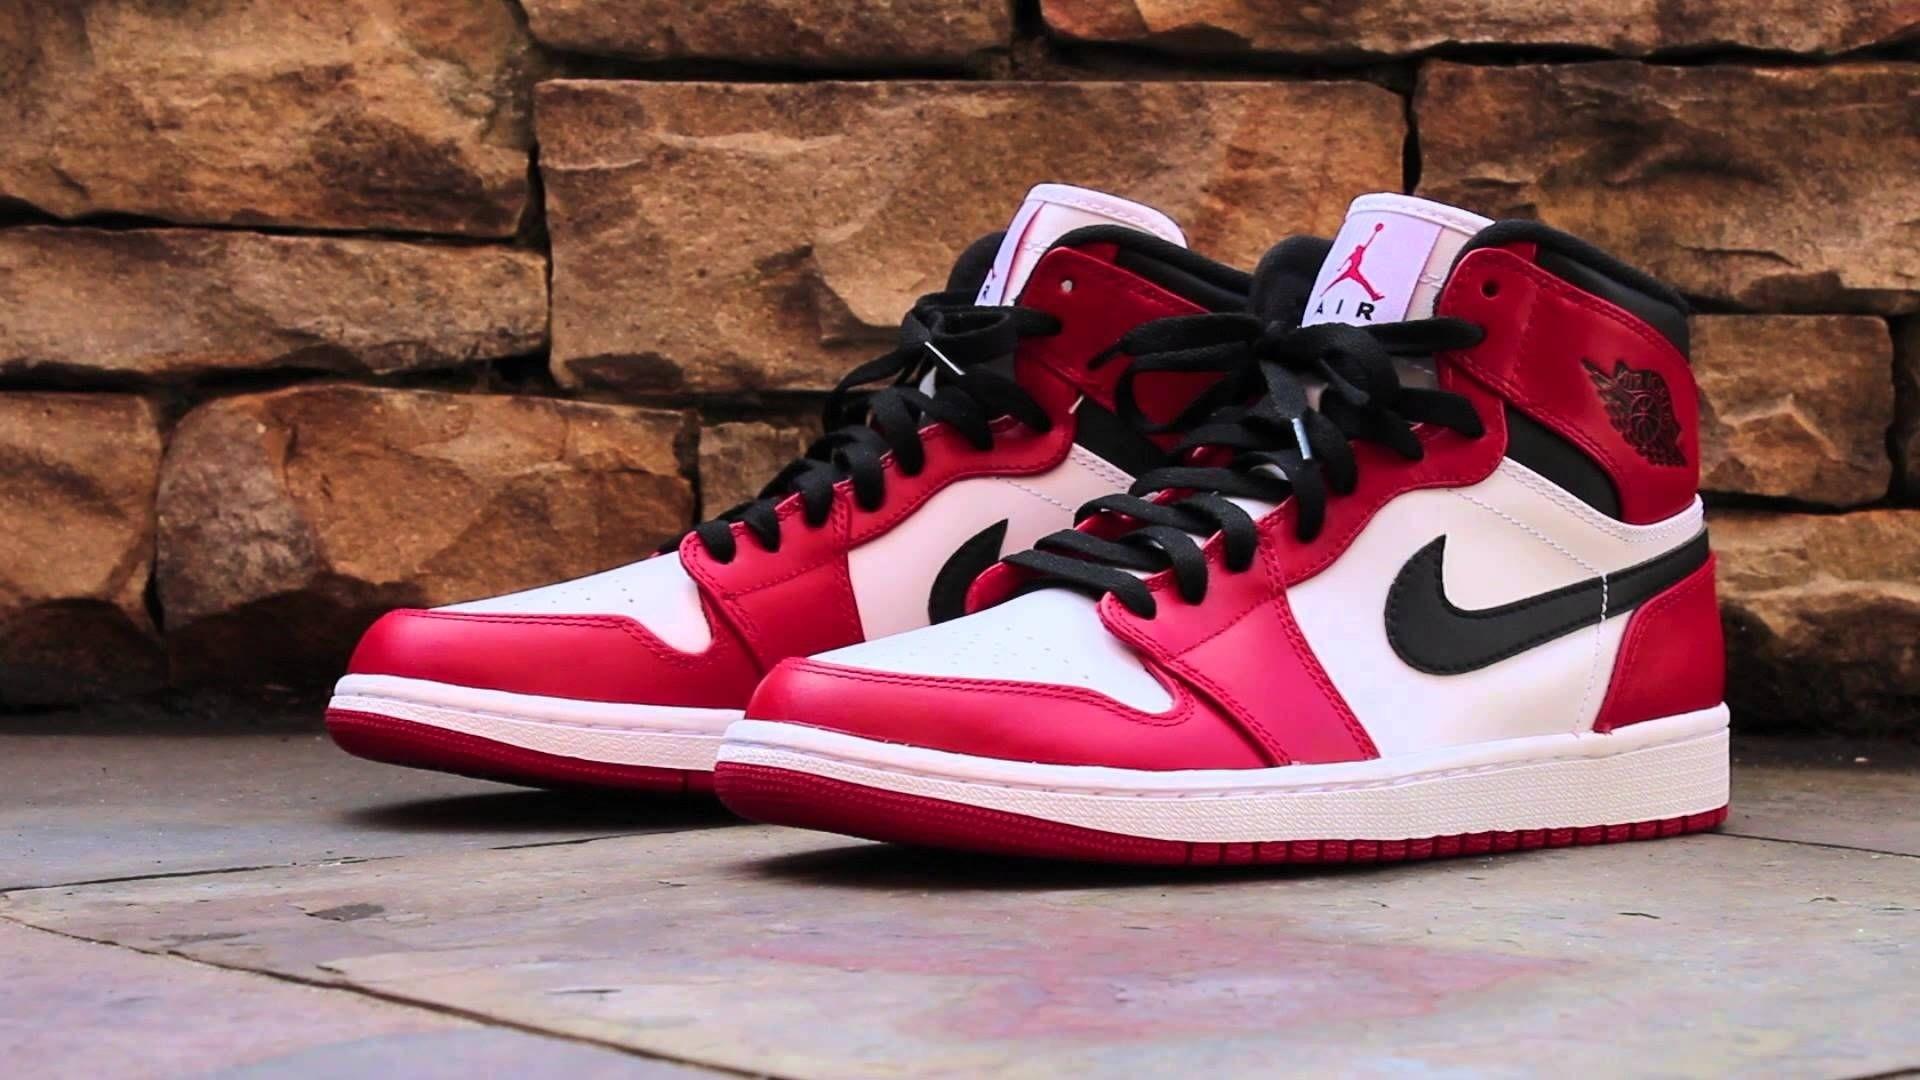 Jordan 1 High Quality